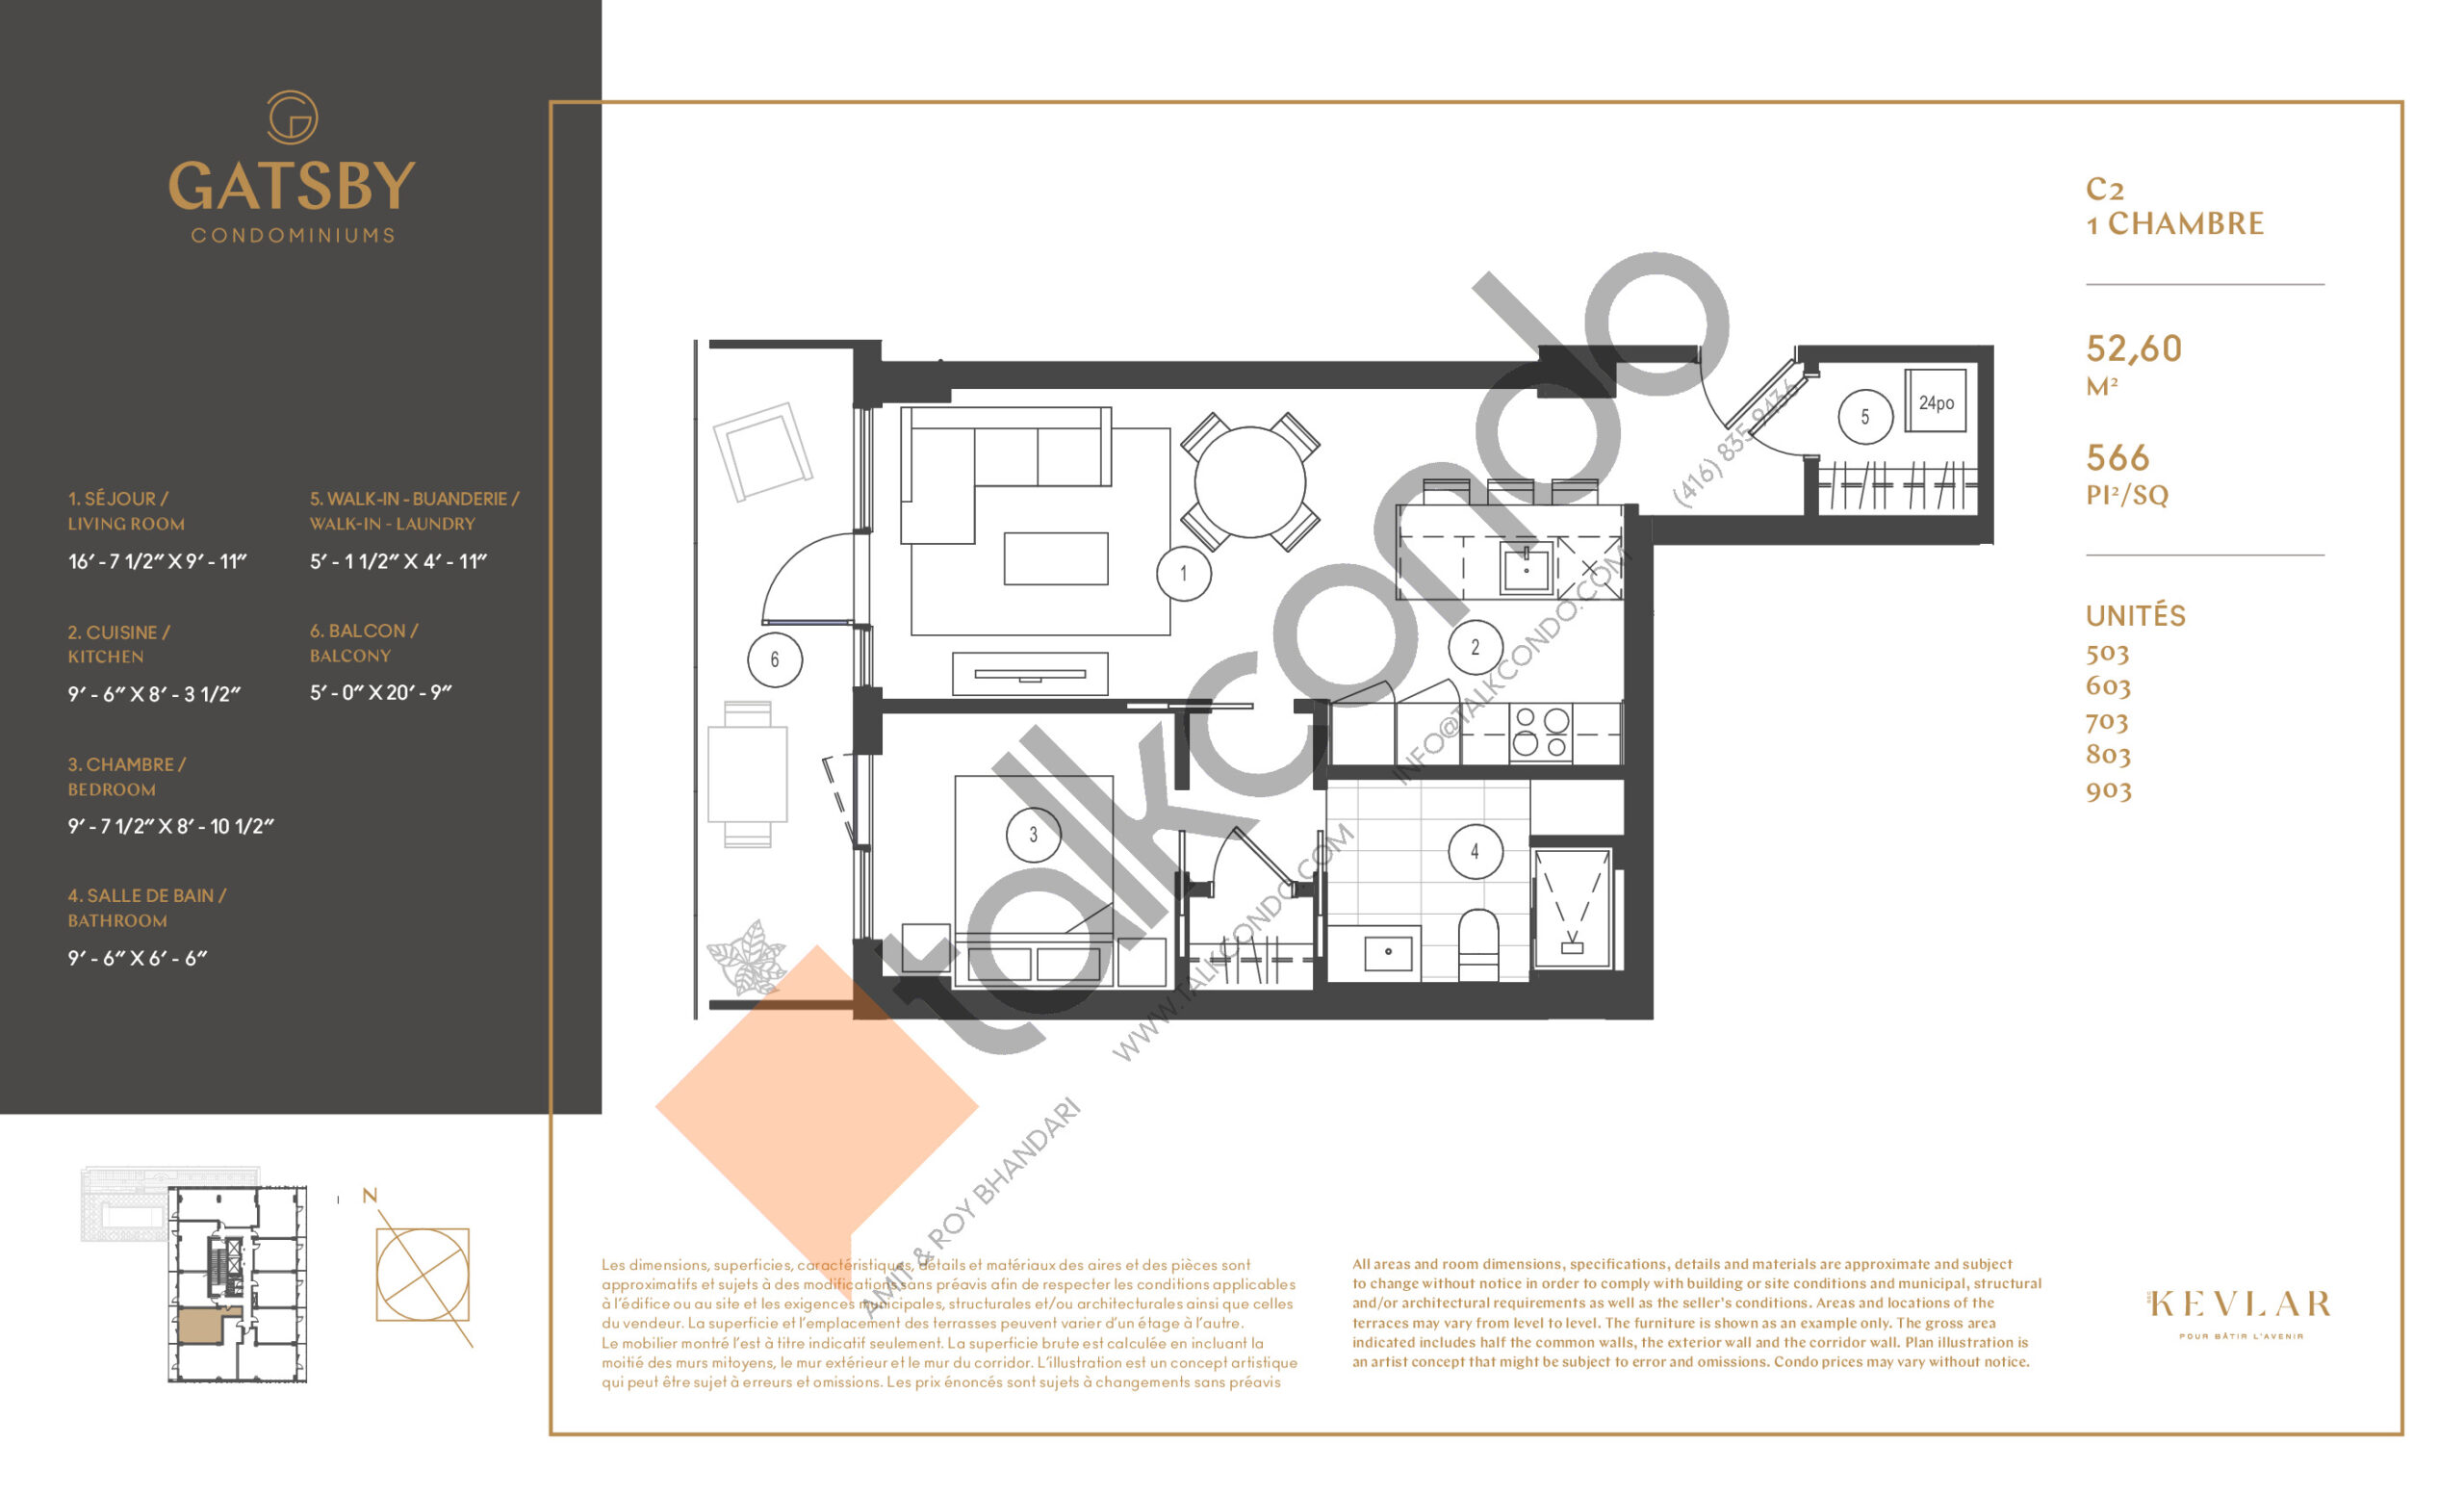 C2 Floor Plan at Gatsby Condos - 566 sq.ft